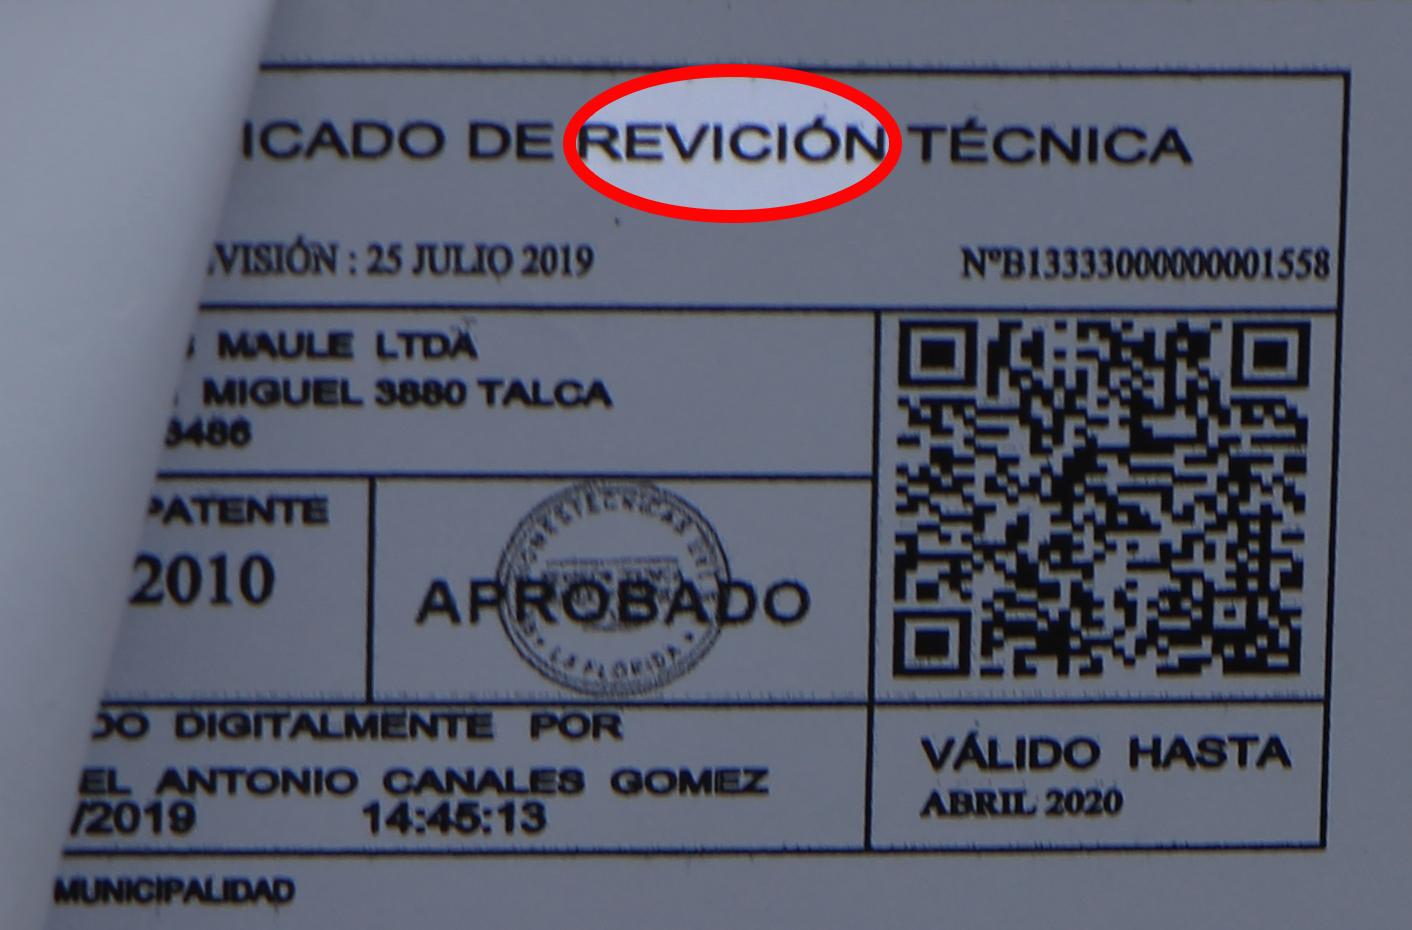 Municipio de San Javier detectó permisos de circulación falsos